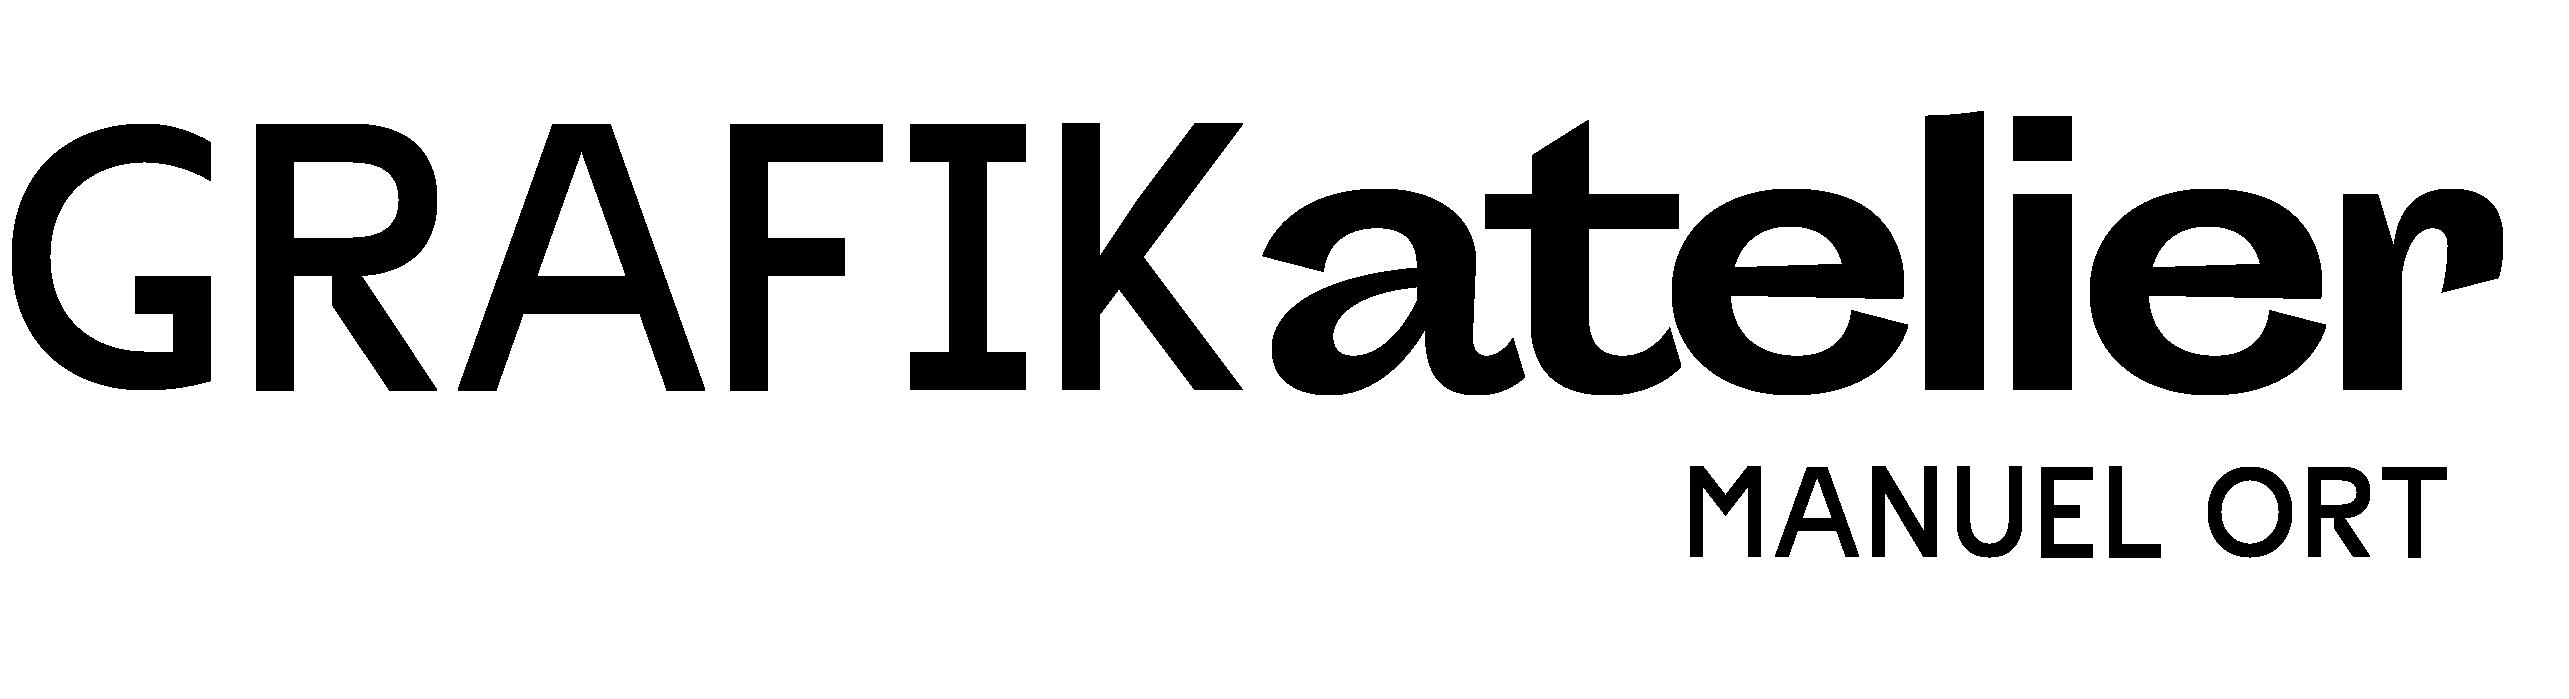 Logo_Grafikateler_Manuel_Ort